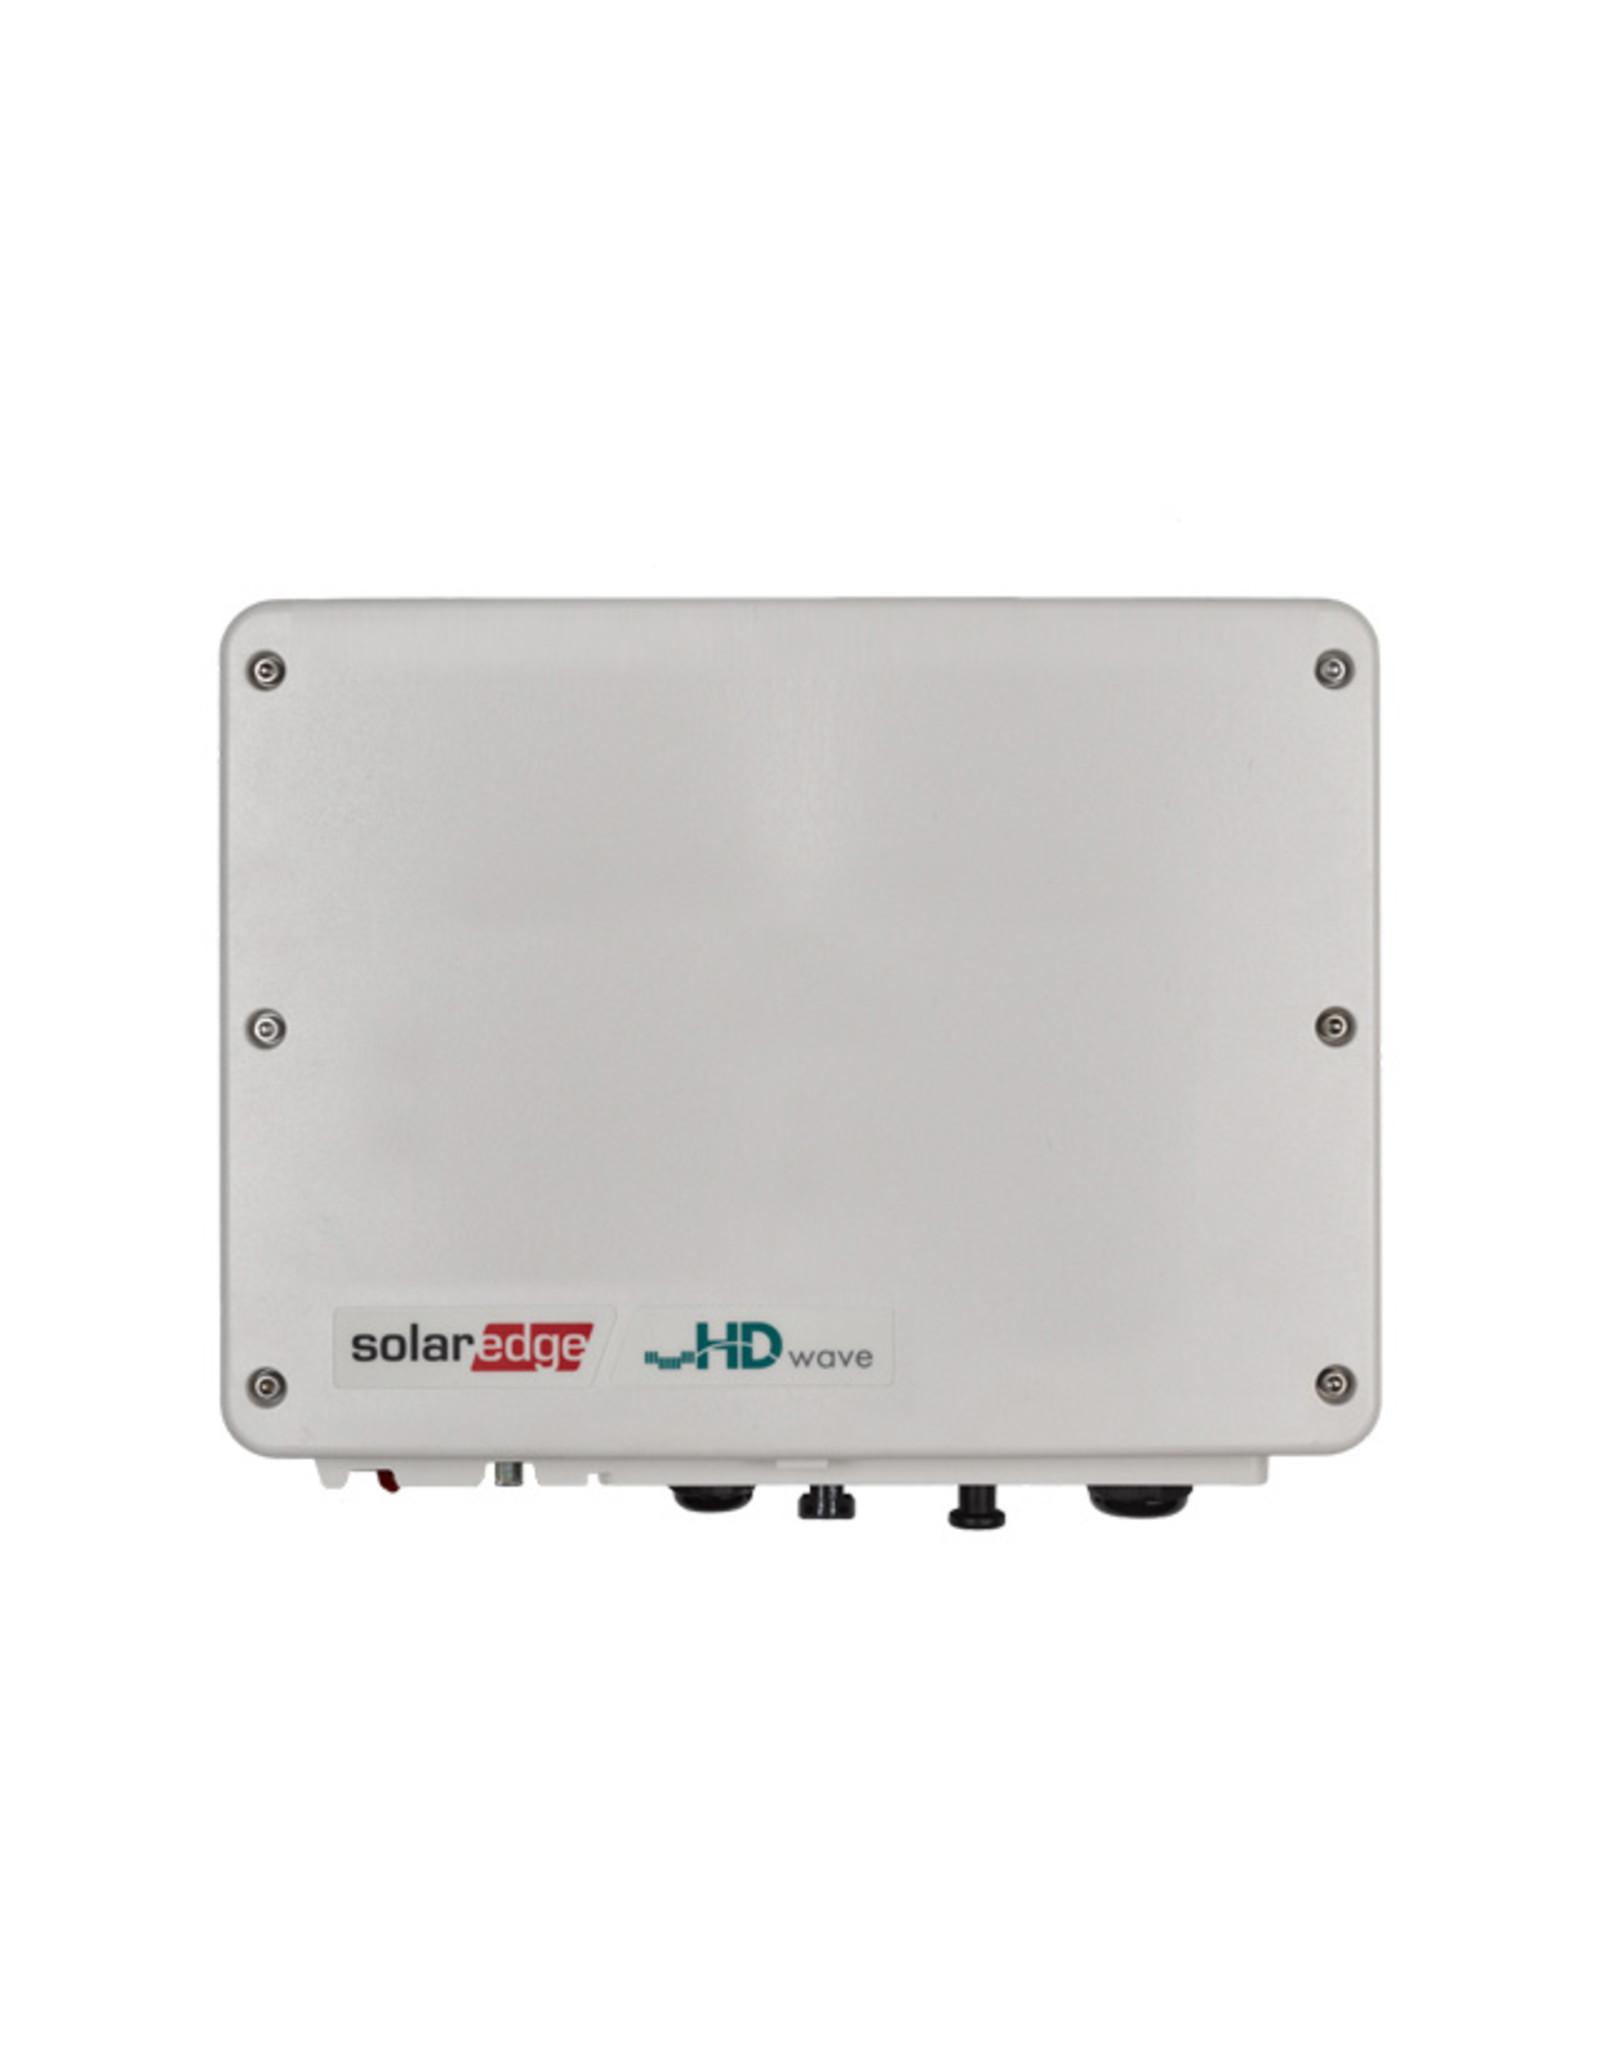 SolarEdge SolarEdge SE3680H enkelfase omvormer 3.68 kW HD-Wave - met SetApp configuratie